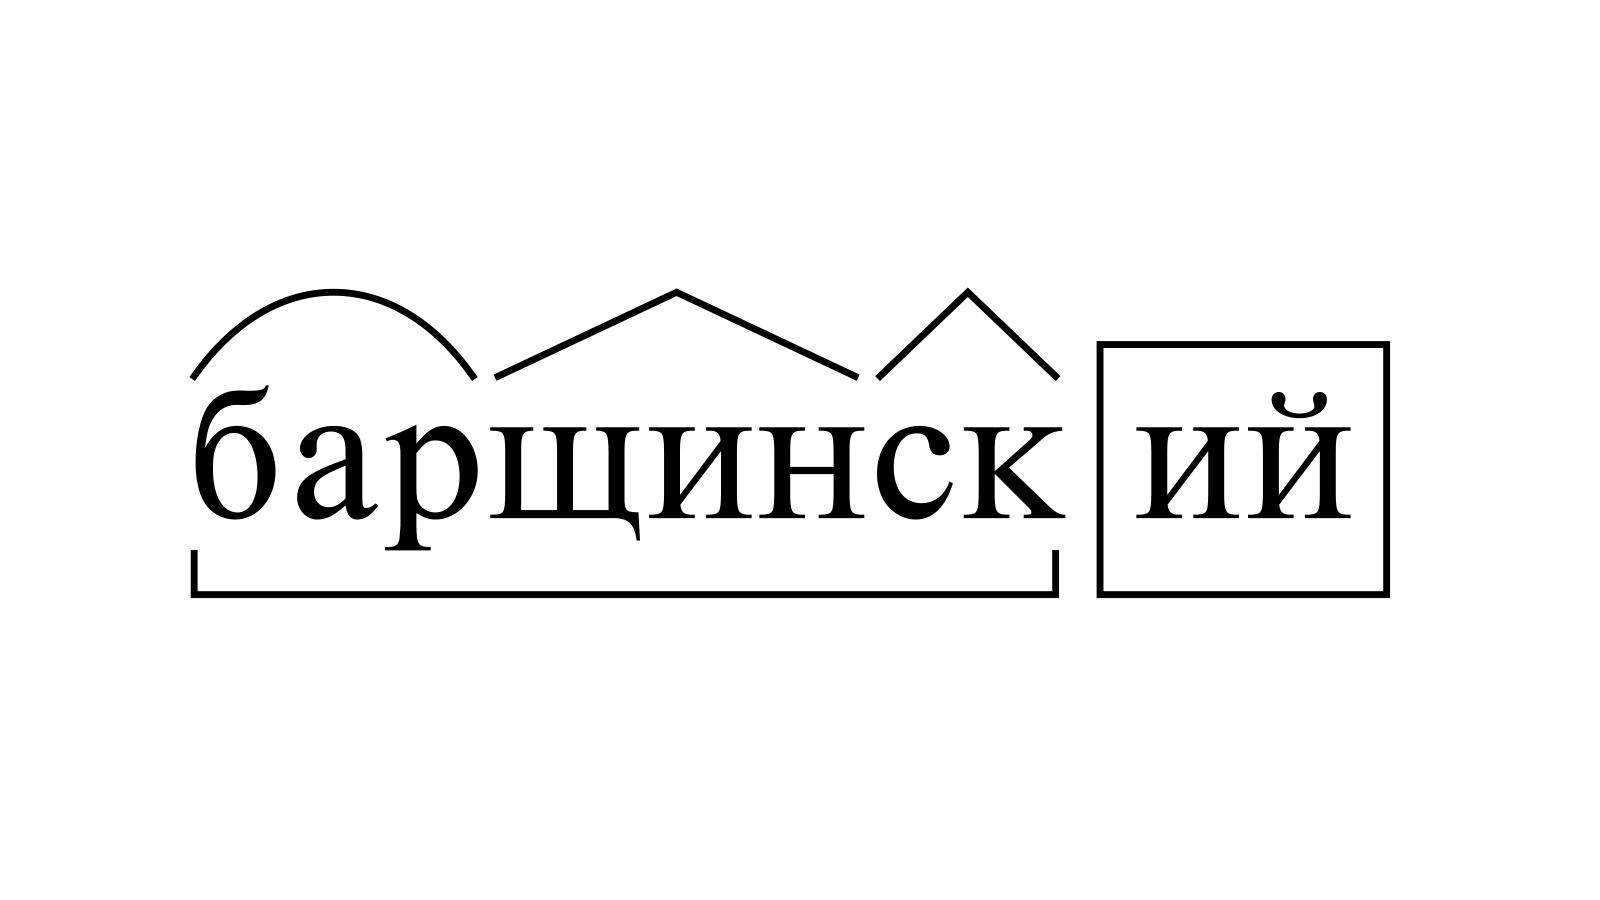 Разбор слова «барщинский» по составу